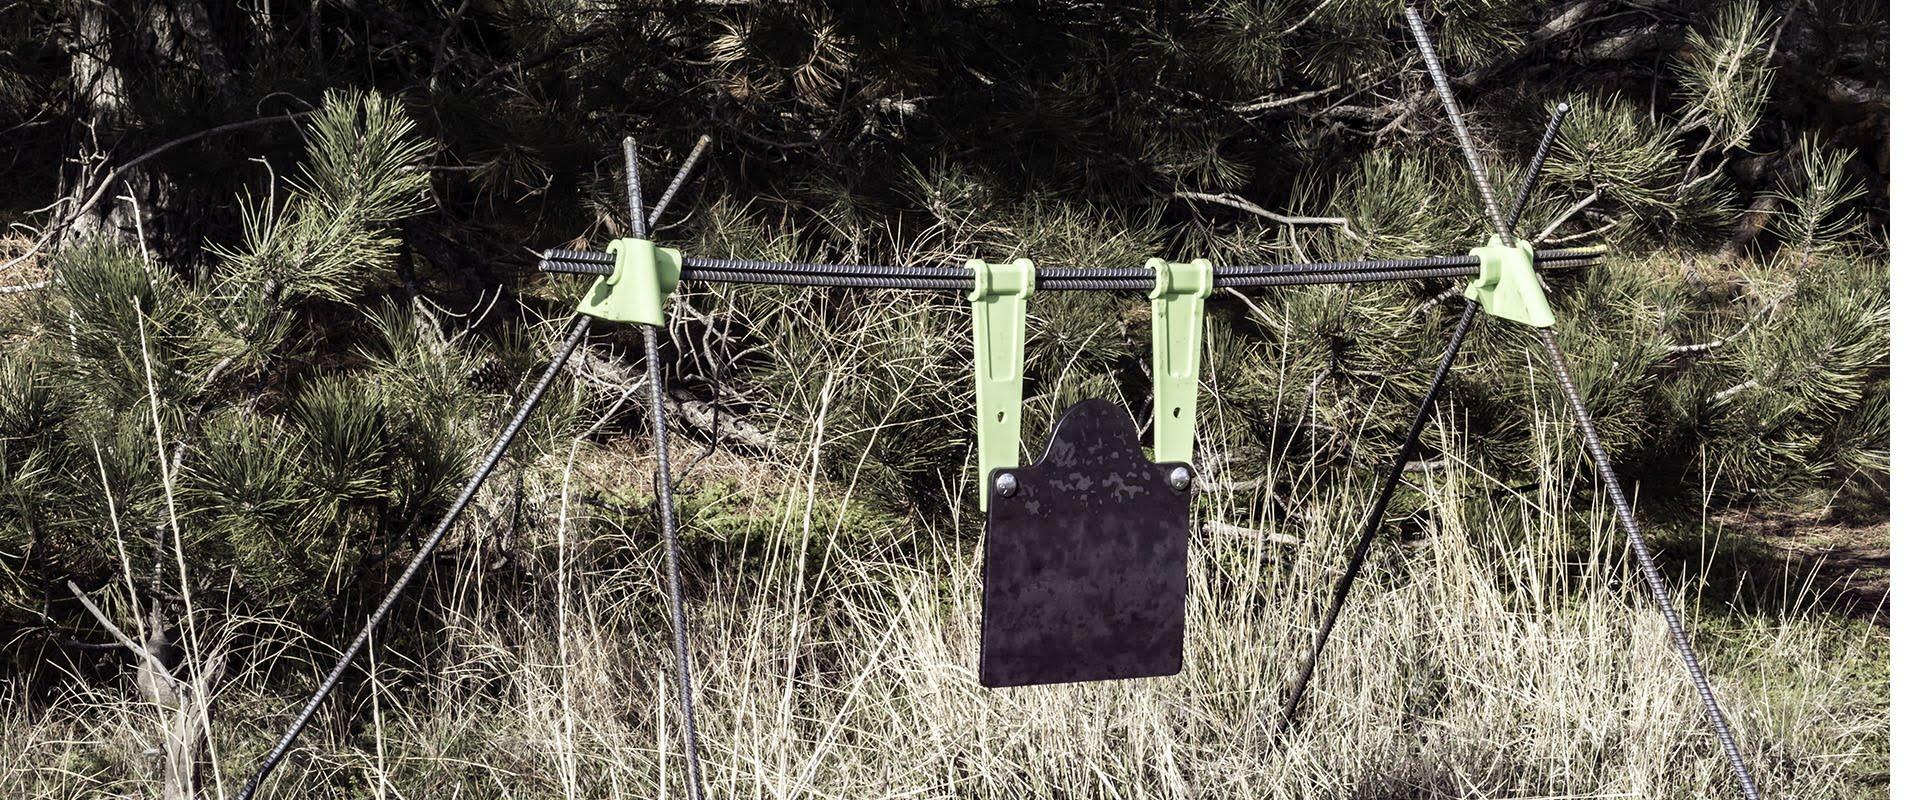 Shooters Element Diy Dueling Tree Kit - DIY Campbellandkellarteam